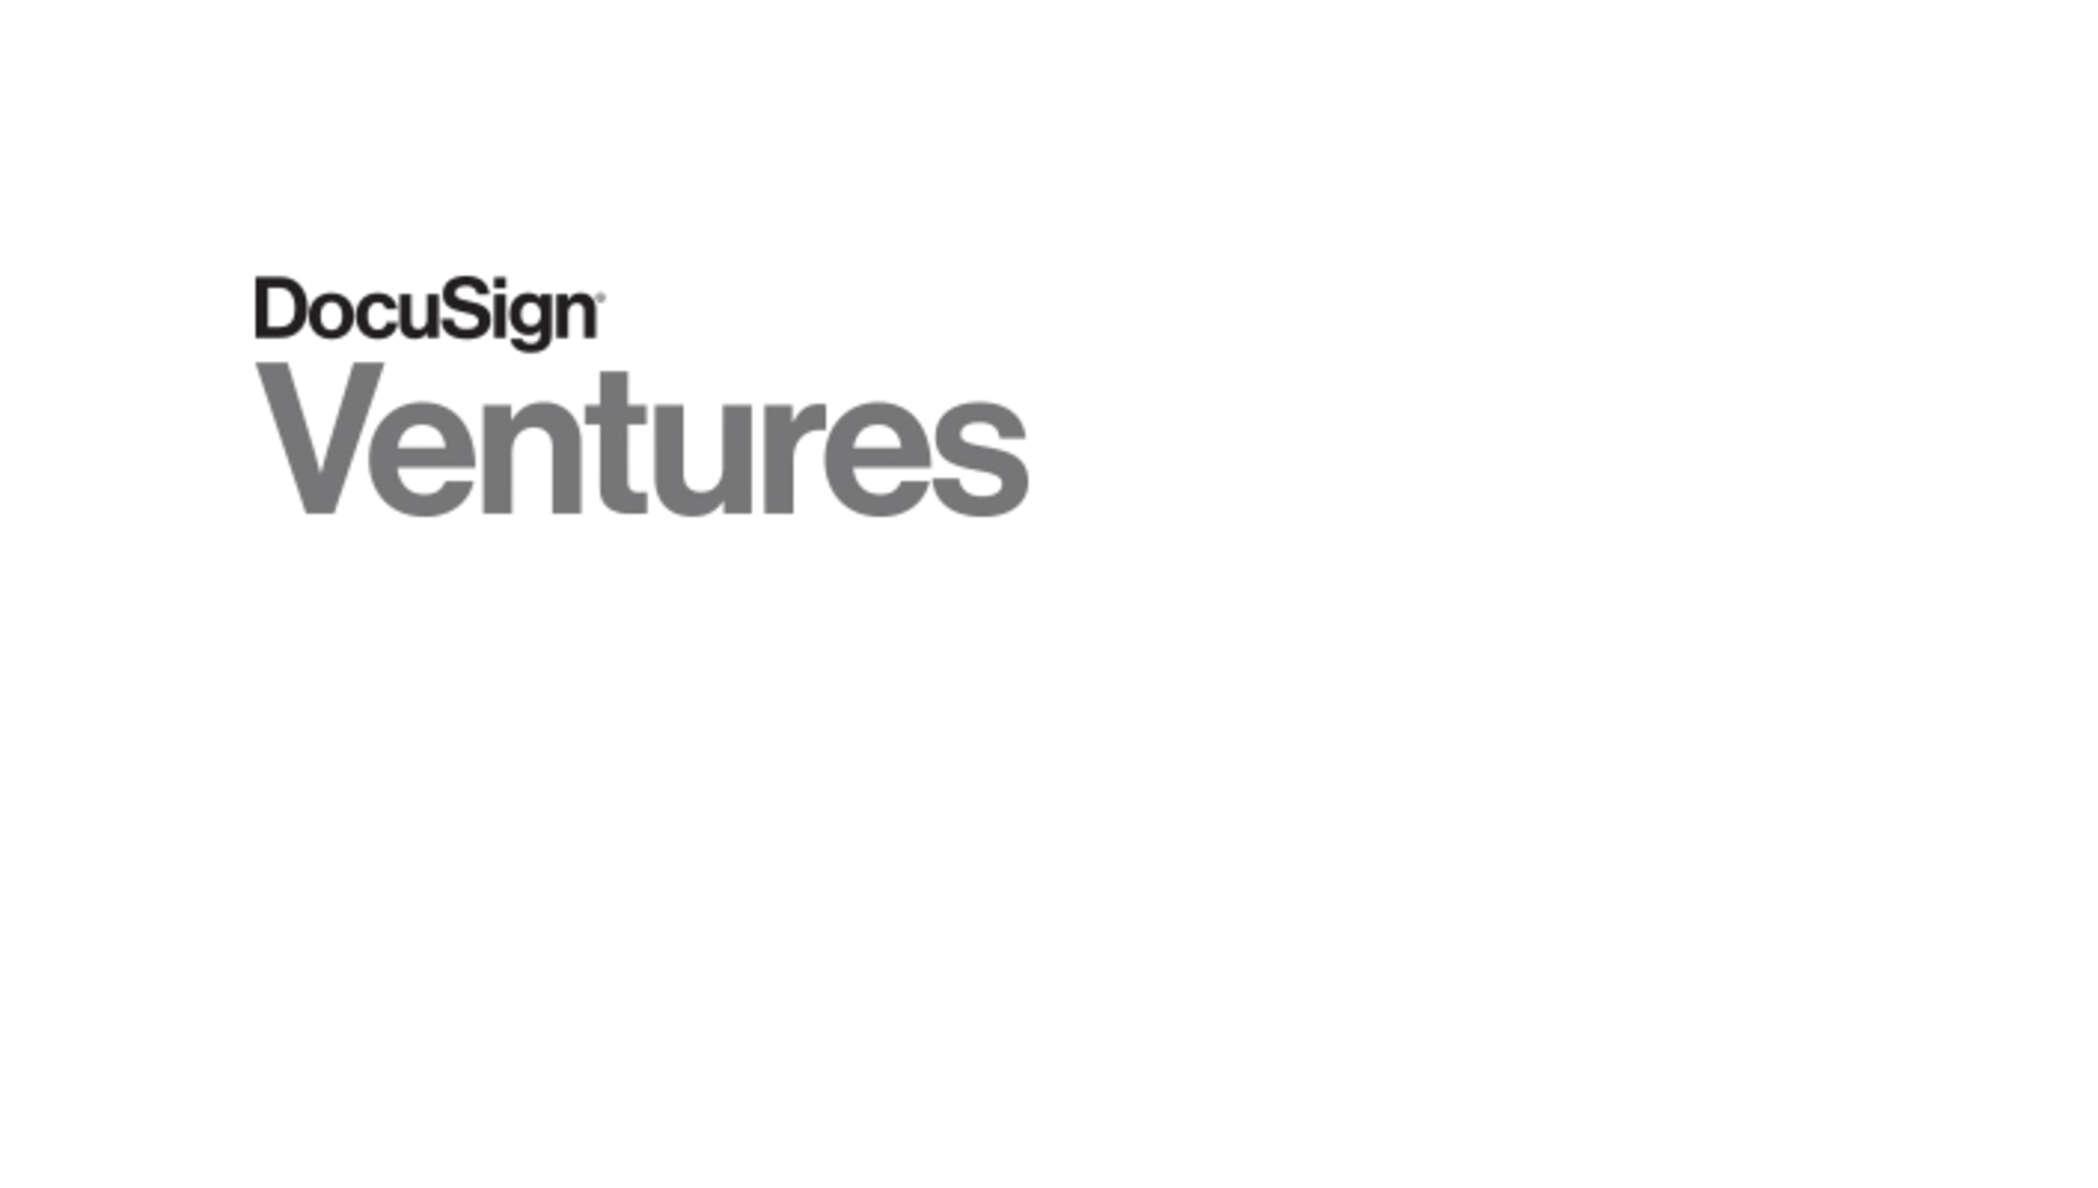 DocuSign Ventures logo